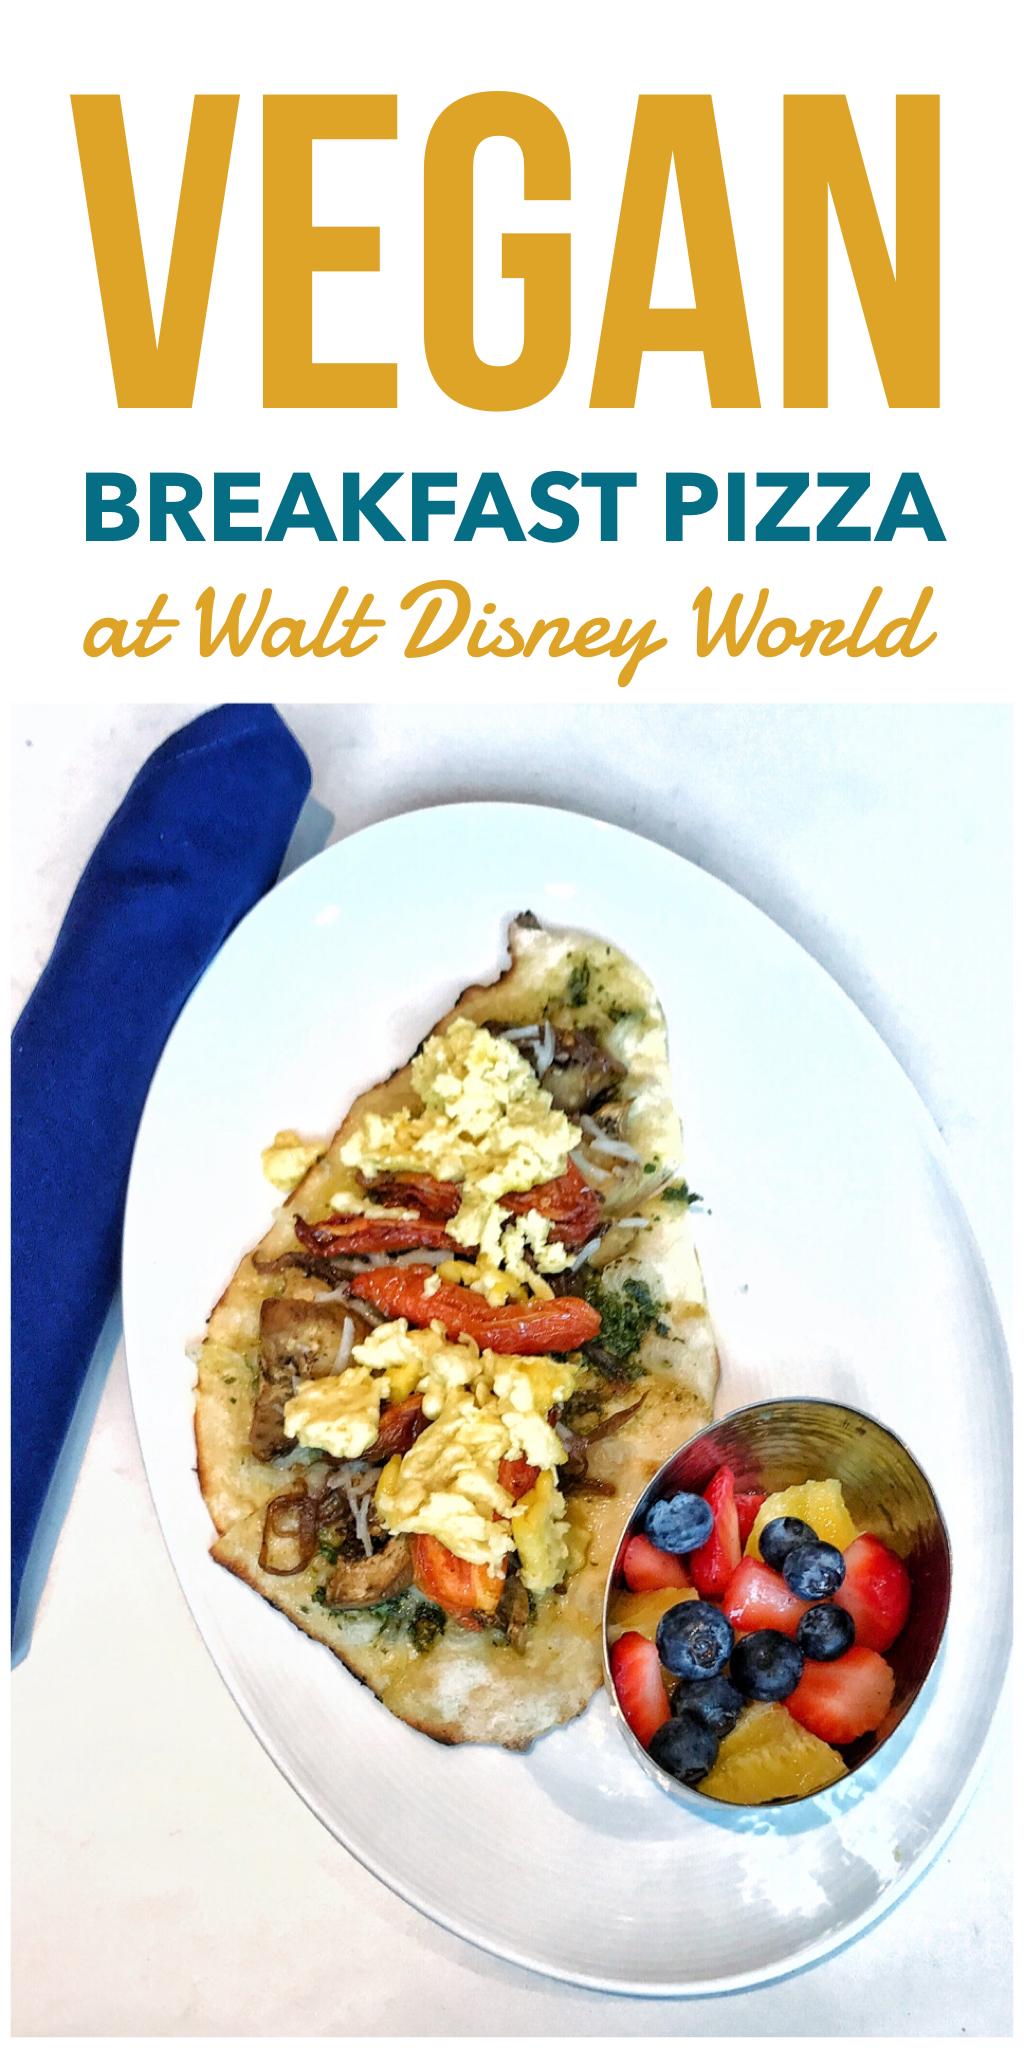 Vegan Breakfast Pizza At Primo Piatto In Disney S Riviera Resort At Walt Disney World In 2020 Vegan Breakfast Pizza Breakfast Pizza Vegas Food